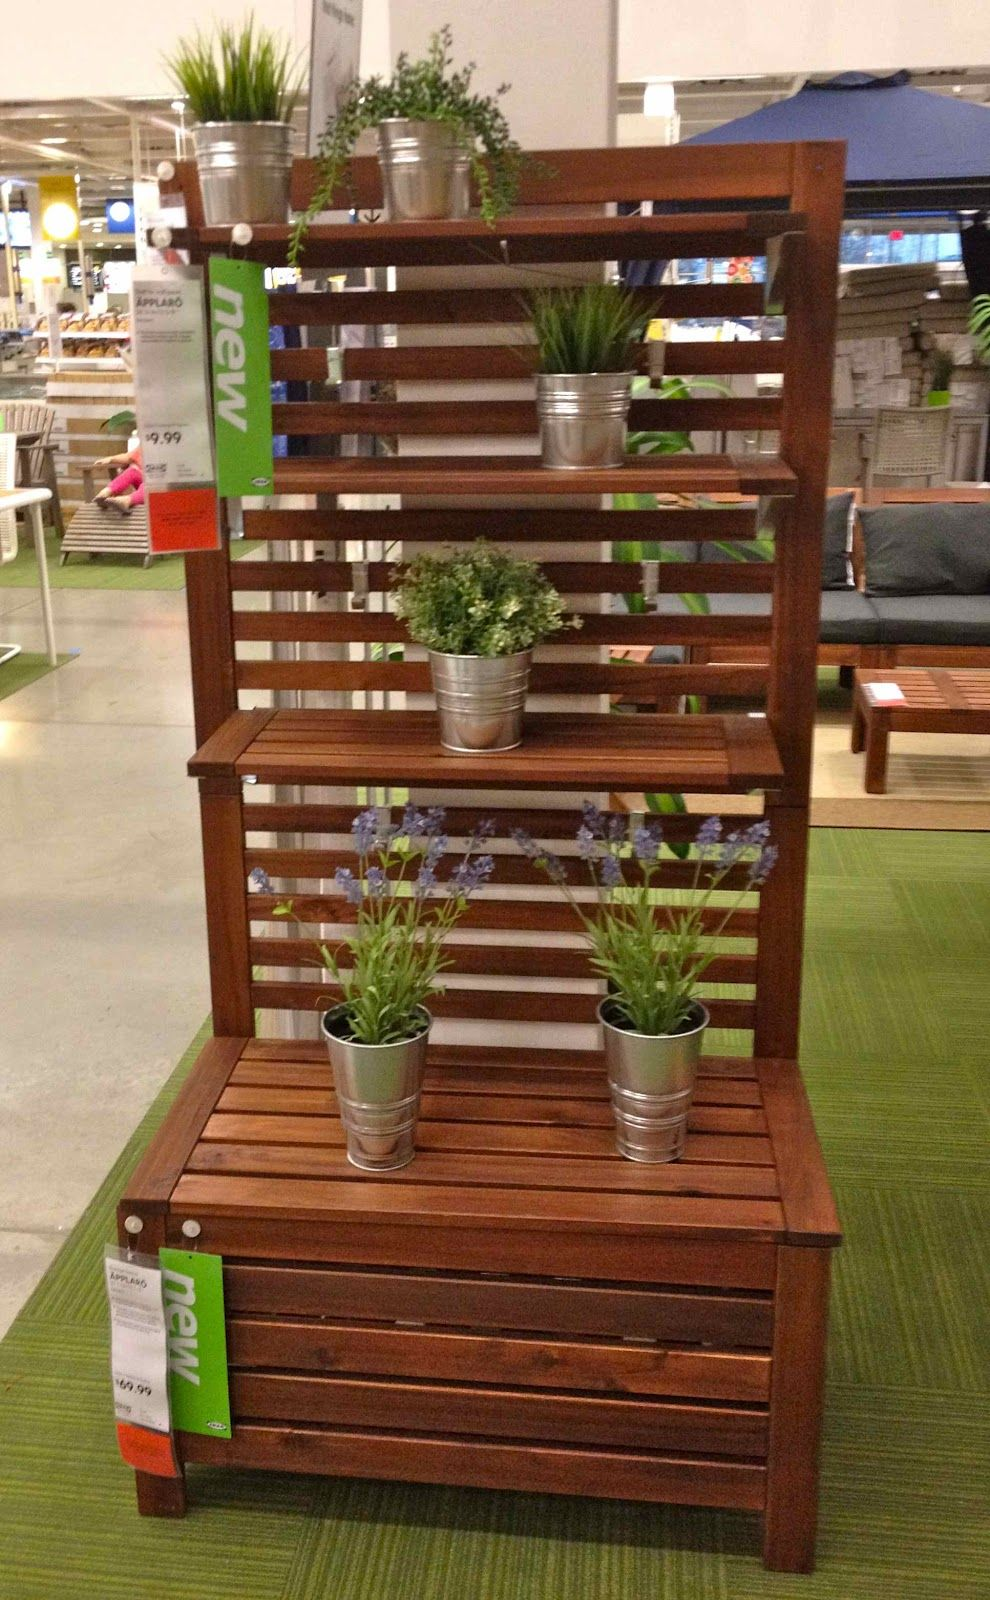 Inexpensive Outdoor Sectionals Driven By Decor Ikea Outdoor Balcony Garden Diy Outdoor Shelves